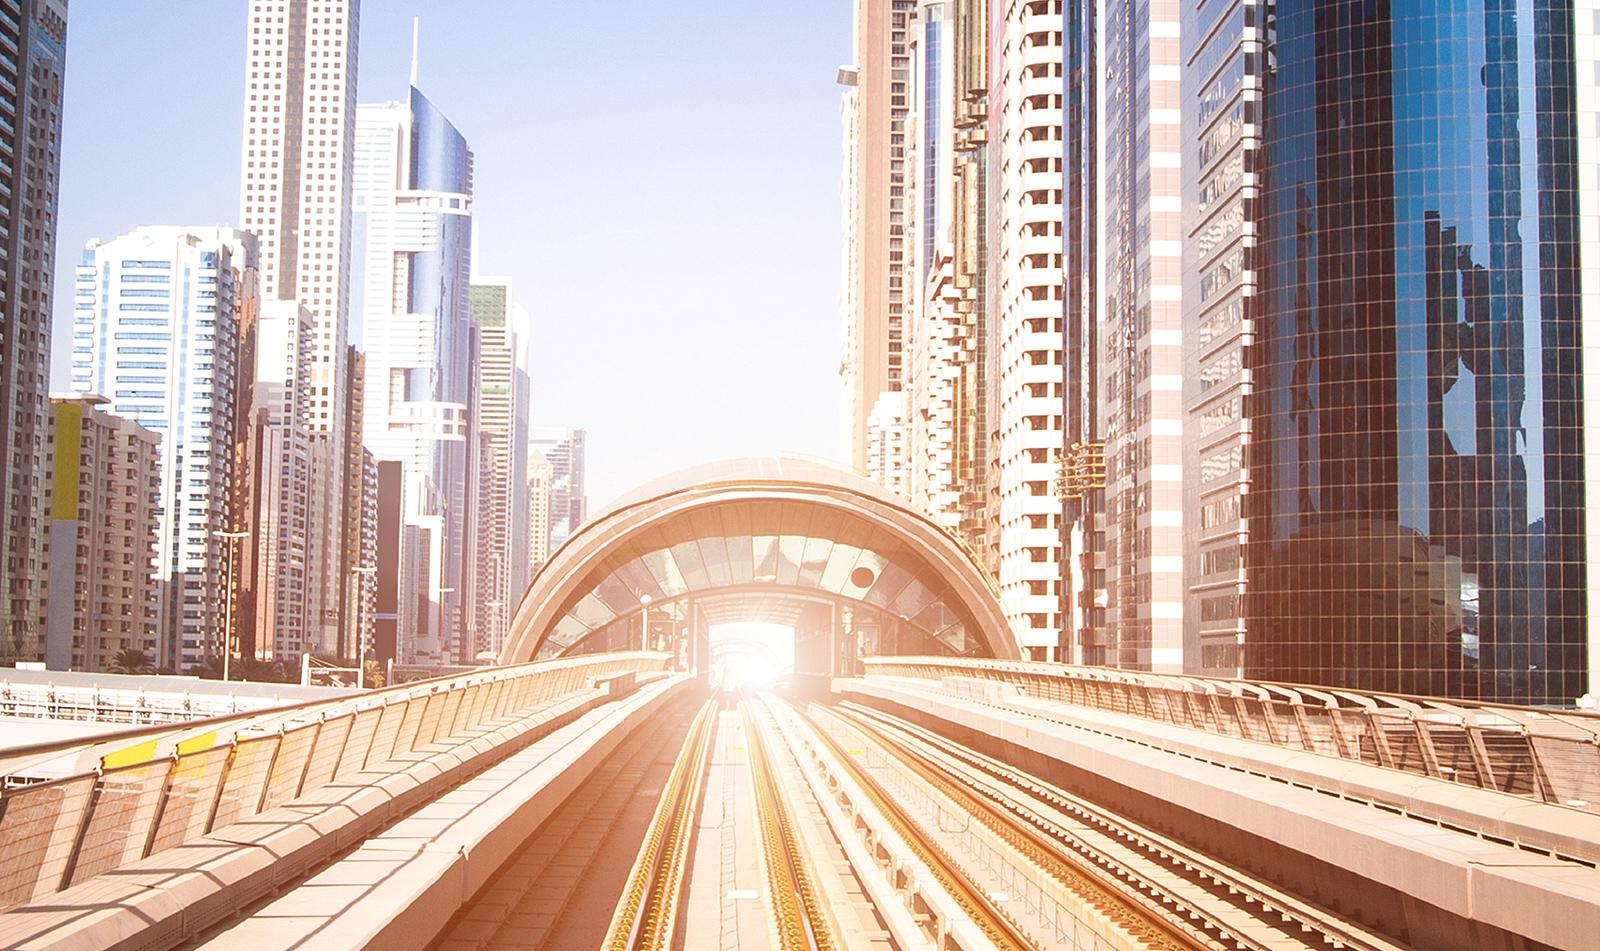 ASU MEP Contractors UAE | Metro Enhancement (3 stations: DIC, DAMAC, UAE Exchange)